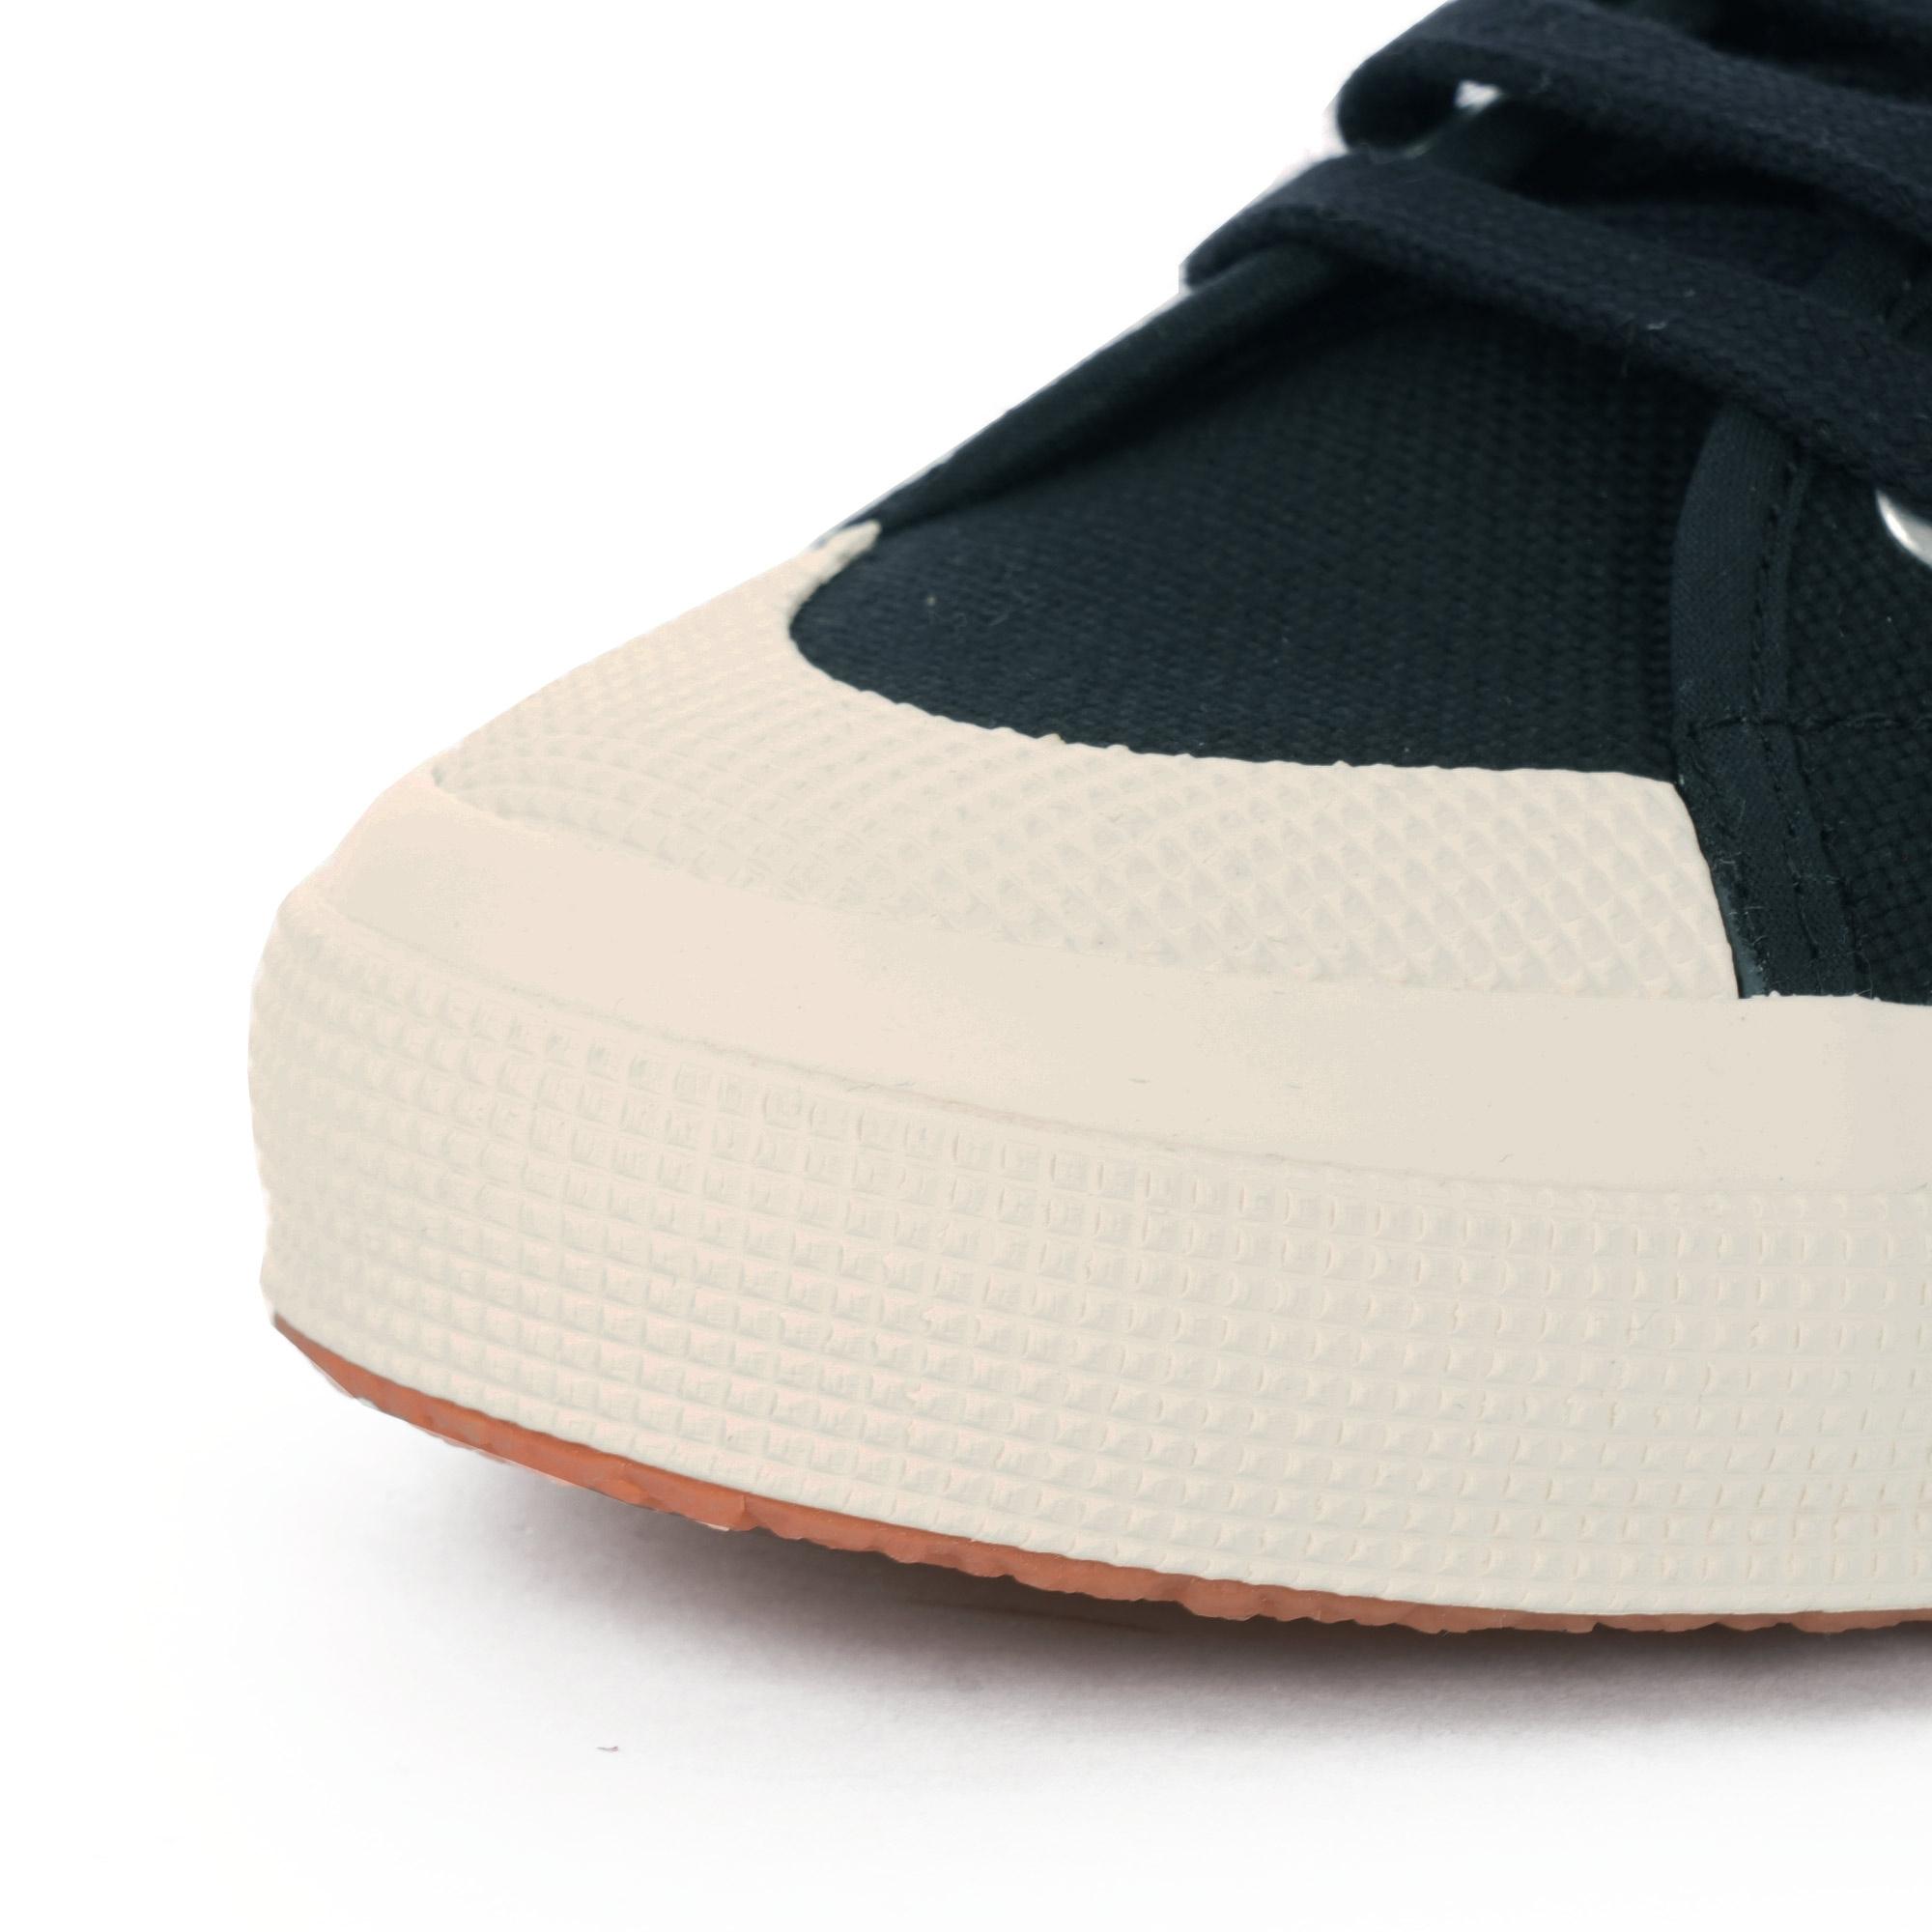 09749aff85 uperga 2390 COTU Shoes (Black) at Dandy Fellow